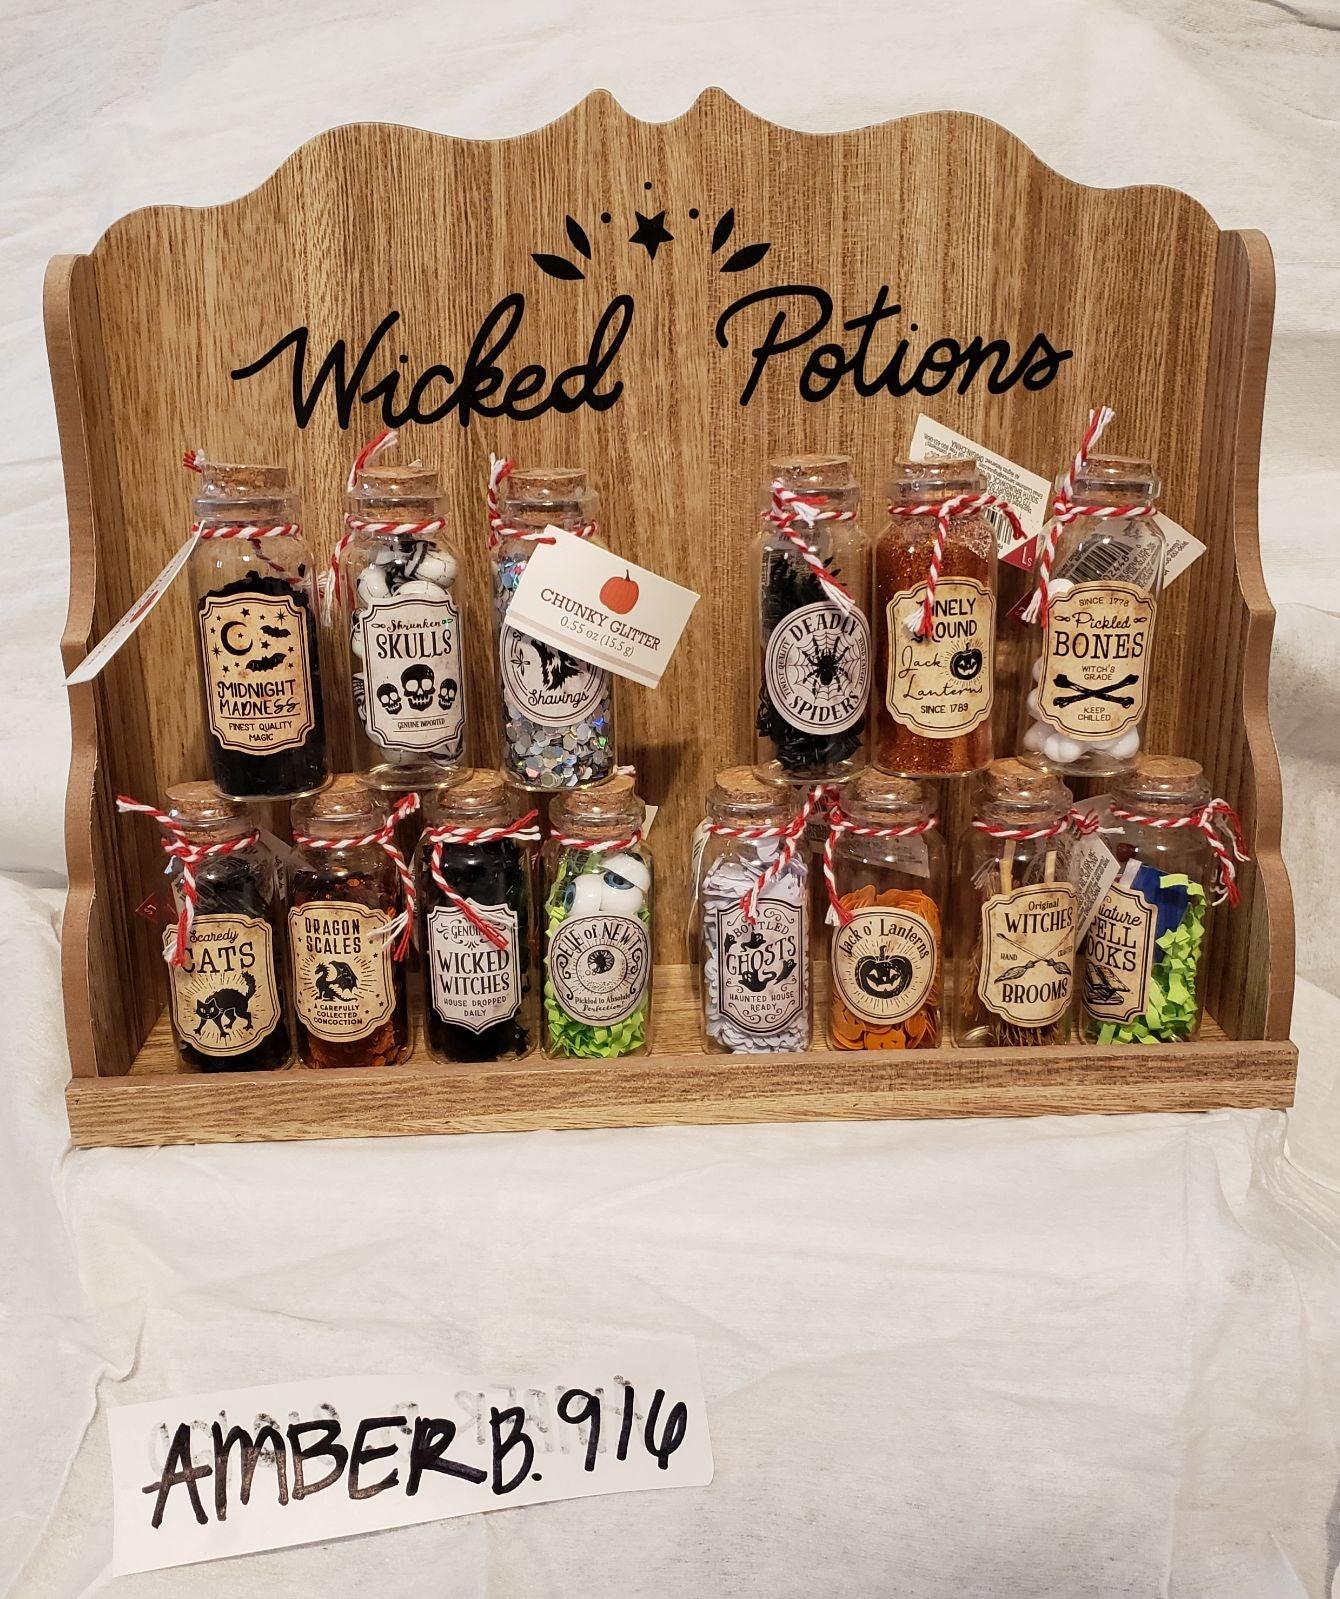 Target potion bottles